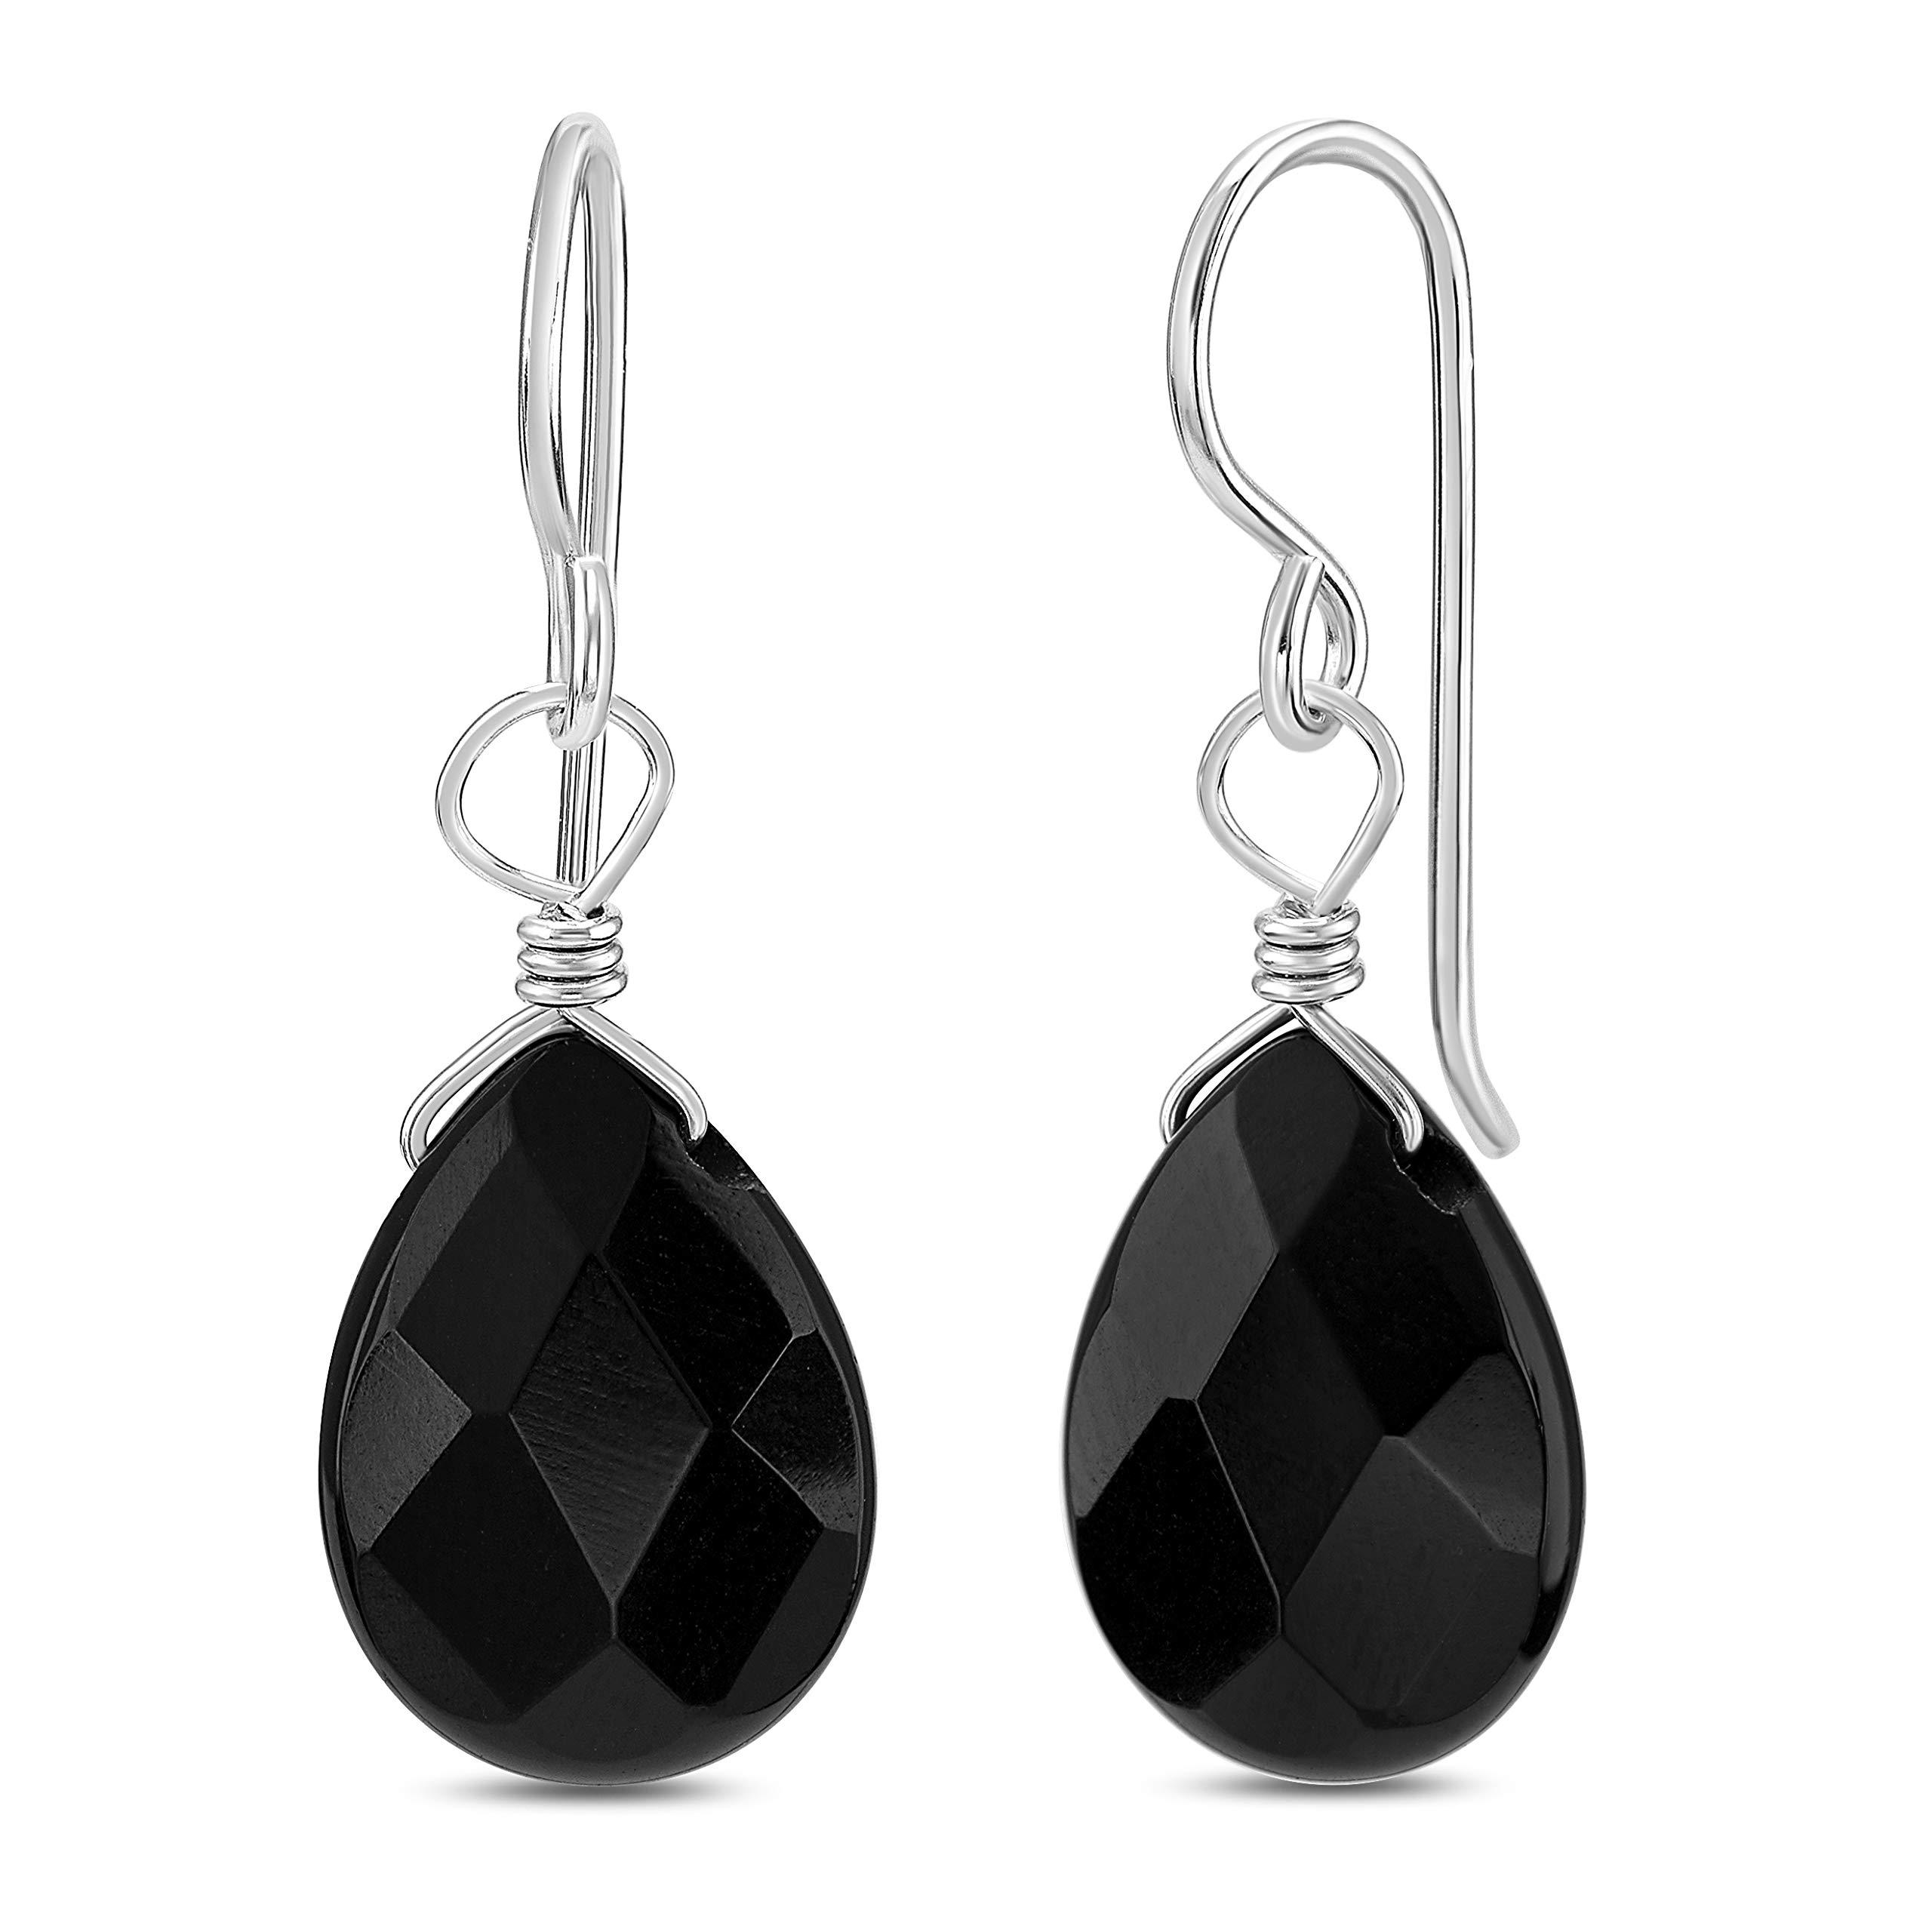 FRONAY Genuine Black Onyx Sterling Silver Drop Dangle Hook Earrings - Made in USA (onyx)